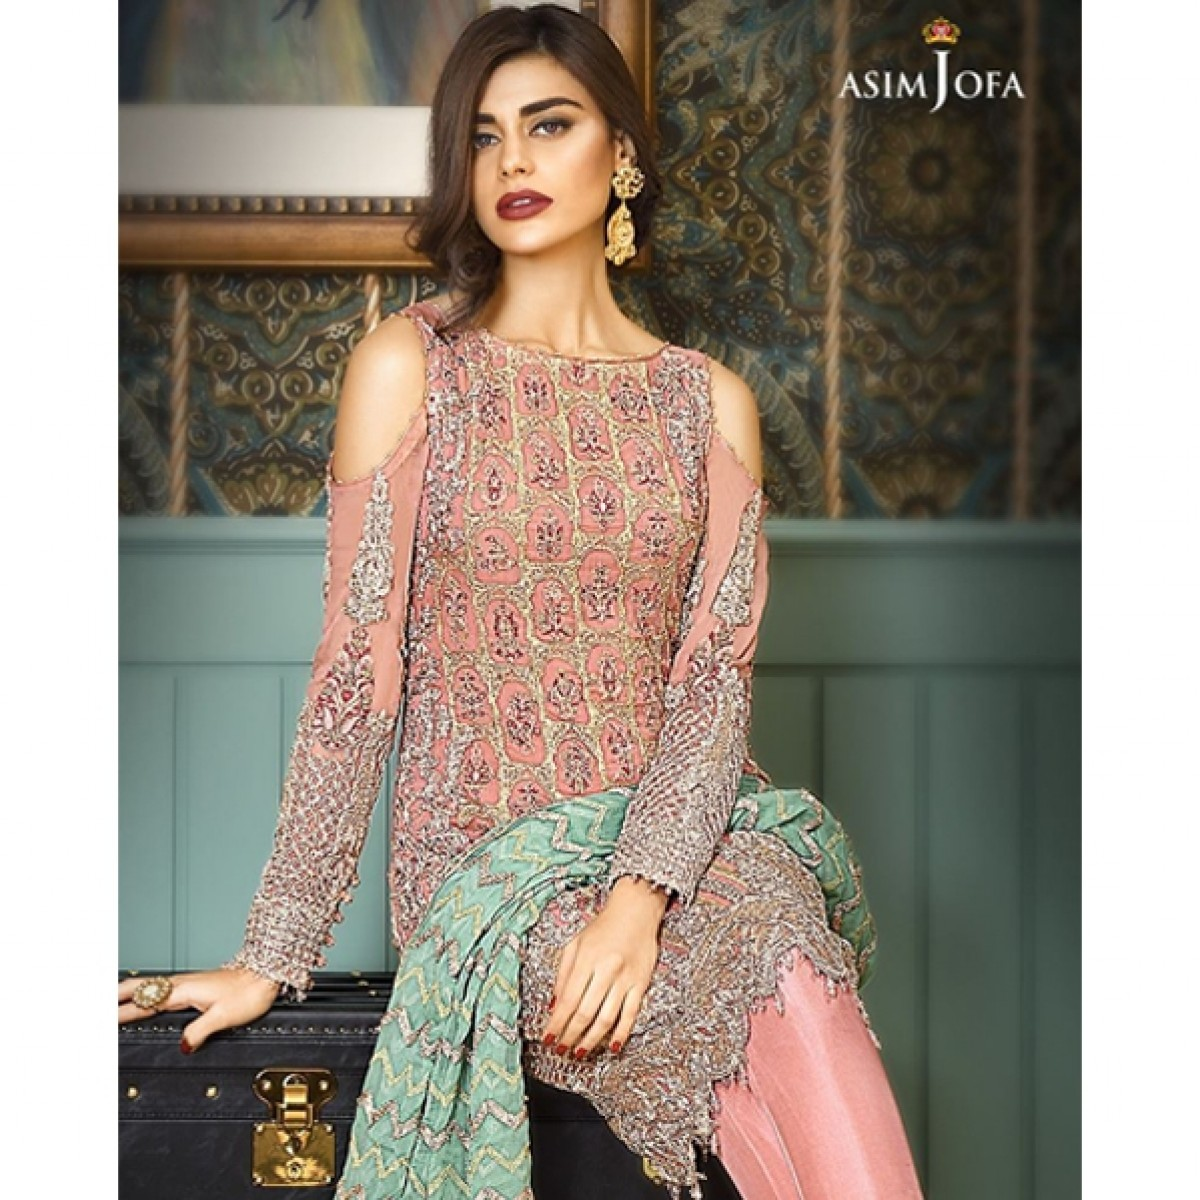 ae8a741dc0 Asim Jofa Mysorie Chiffon Collection Vol-4 Price in Pakistan   Buy Asim Jofa  2017 Collection Vol-4 (AJC-06A)   iShiopping.pk